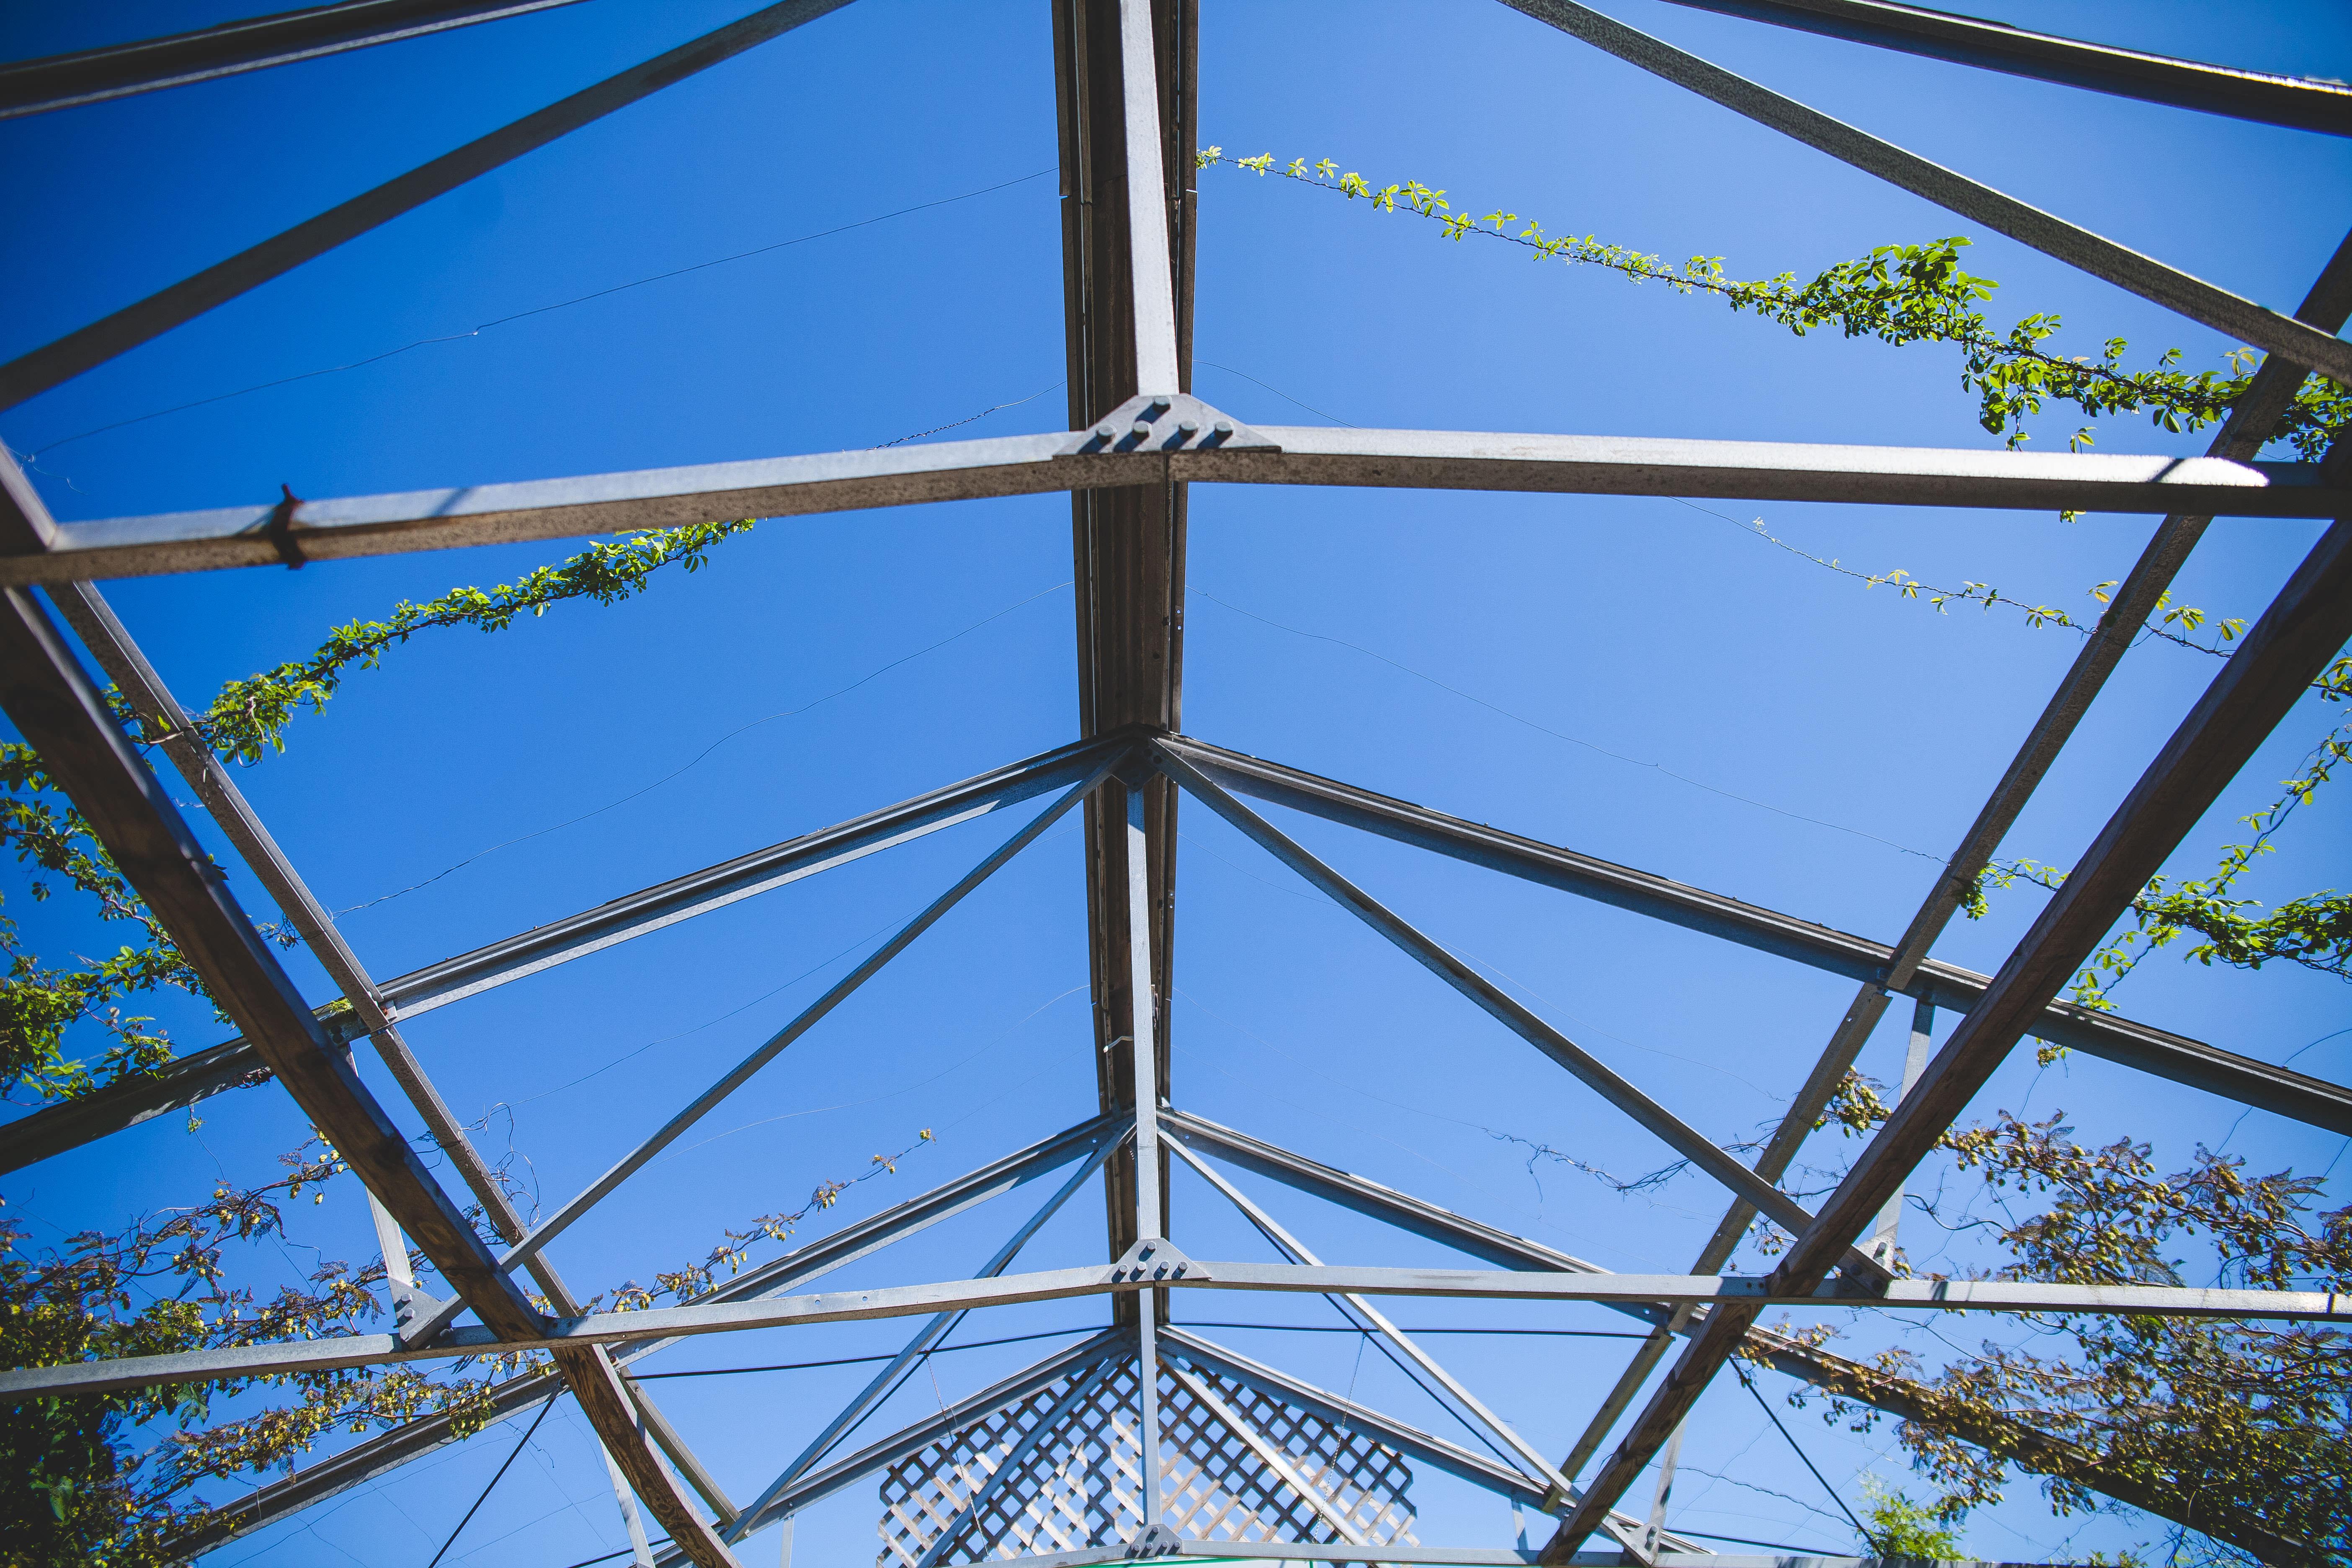 Konstruksi Rangka Atap Baja Ringan Pilihan Tepat Rumah Anda